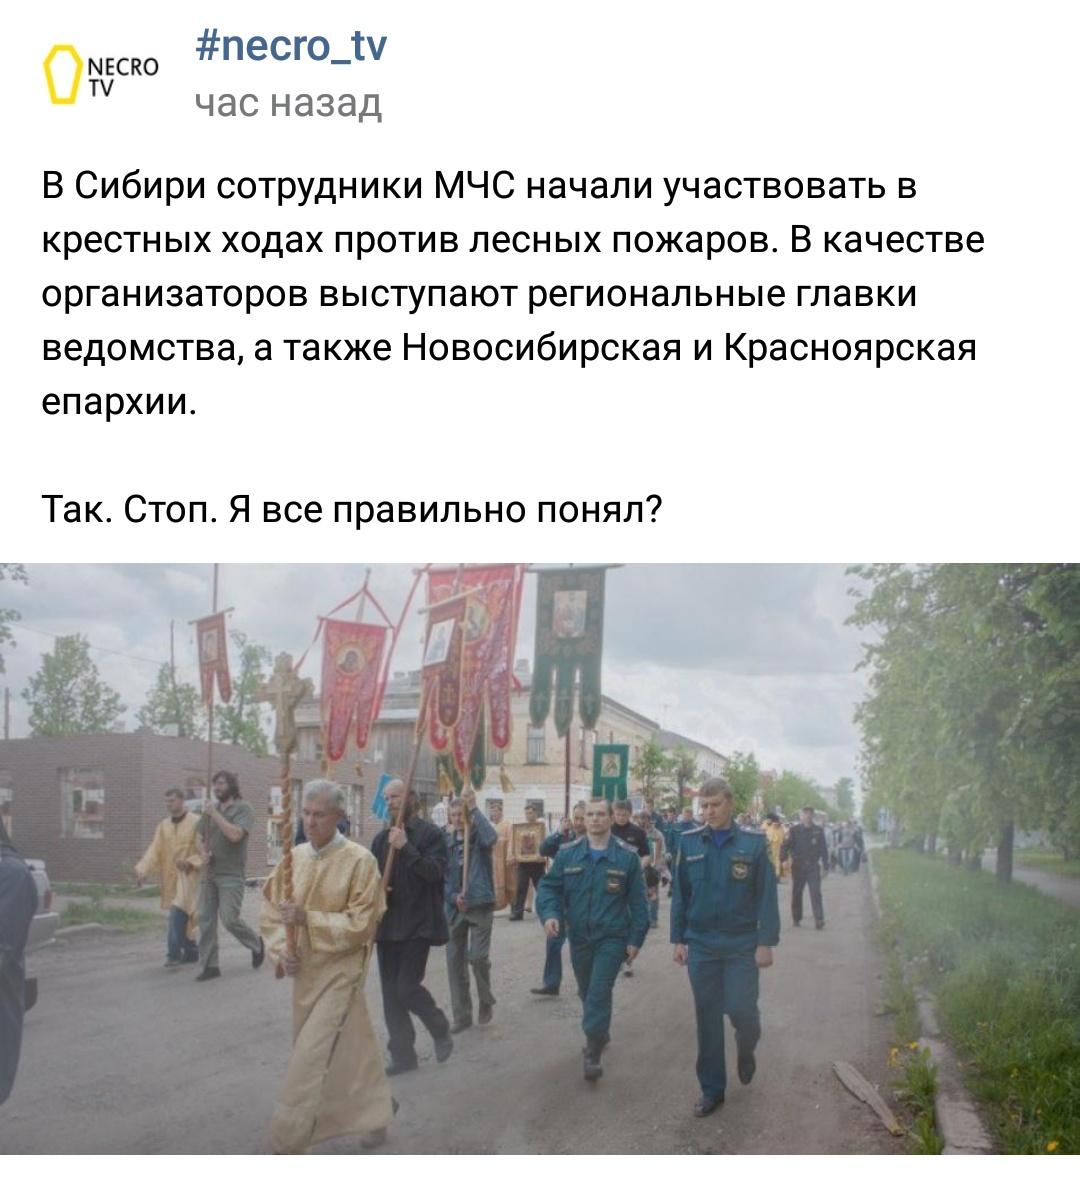 Screenshot_2019-07-30-13-26-39-014_com.vkontakte.android.jpg